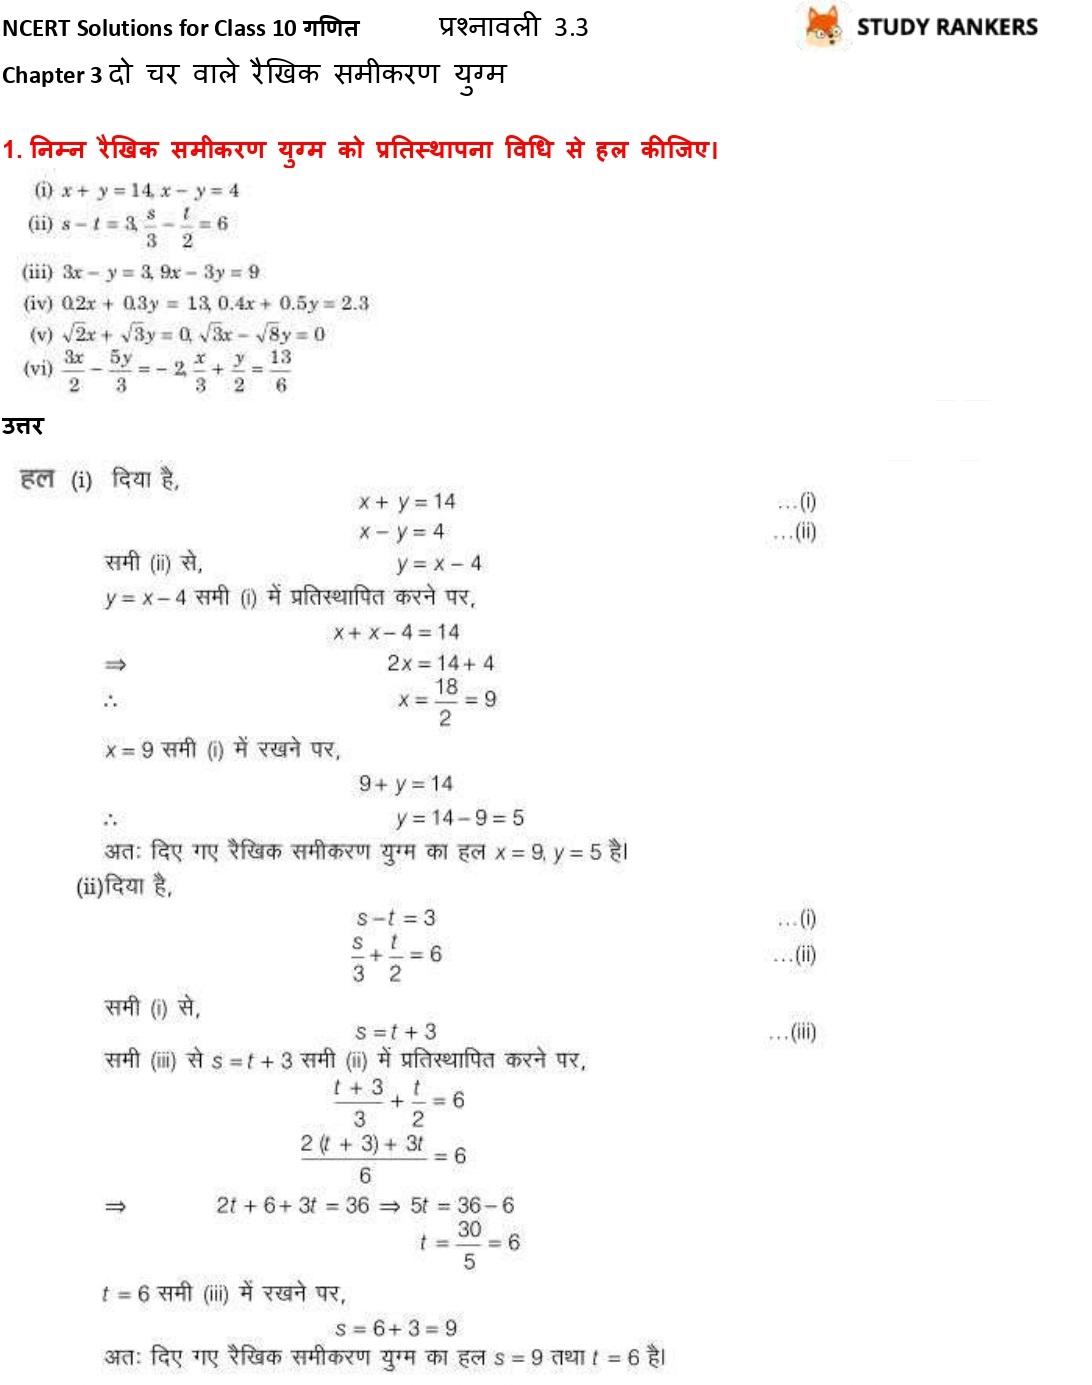 NCERT Solutions for Class 10 Maths Chapter 3 दो चर वाले रैखिक समीकरण युग्म प्रश्नावली 3.3 Part 1